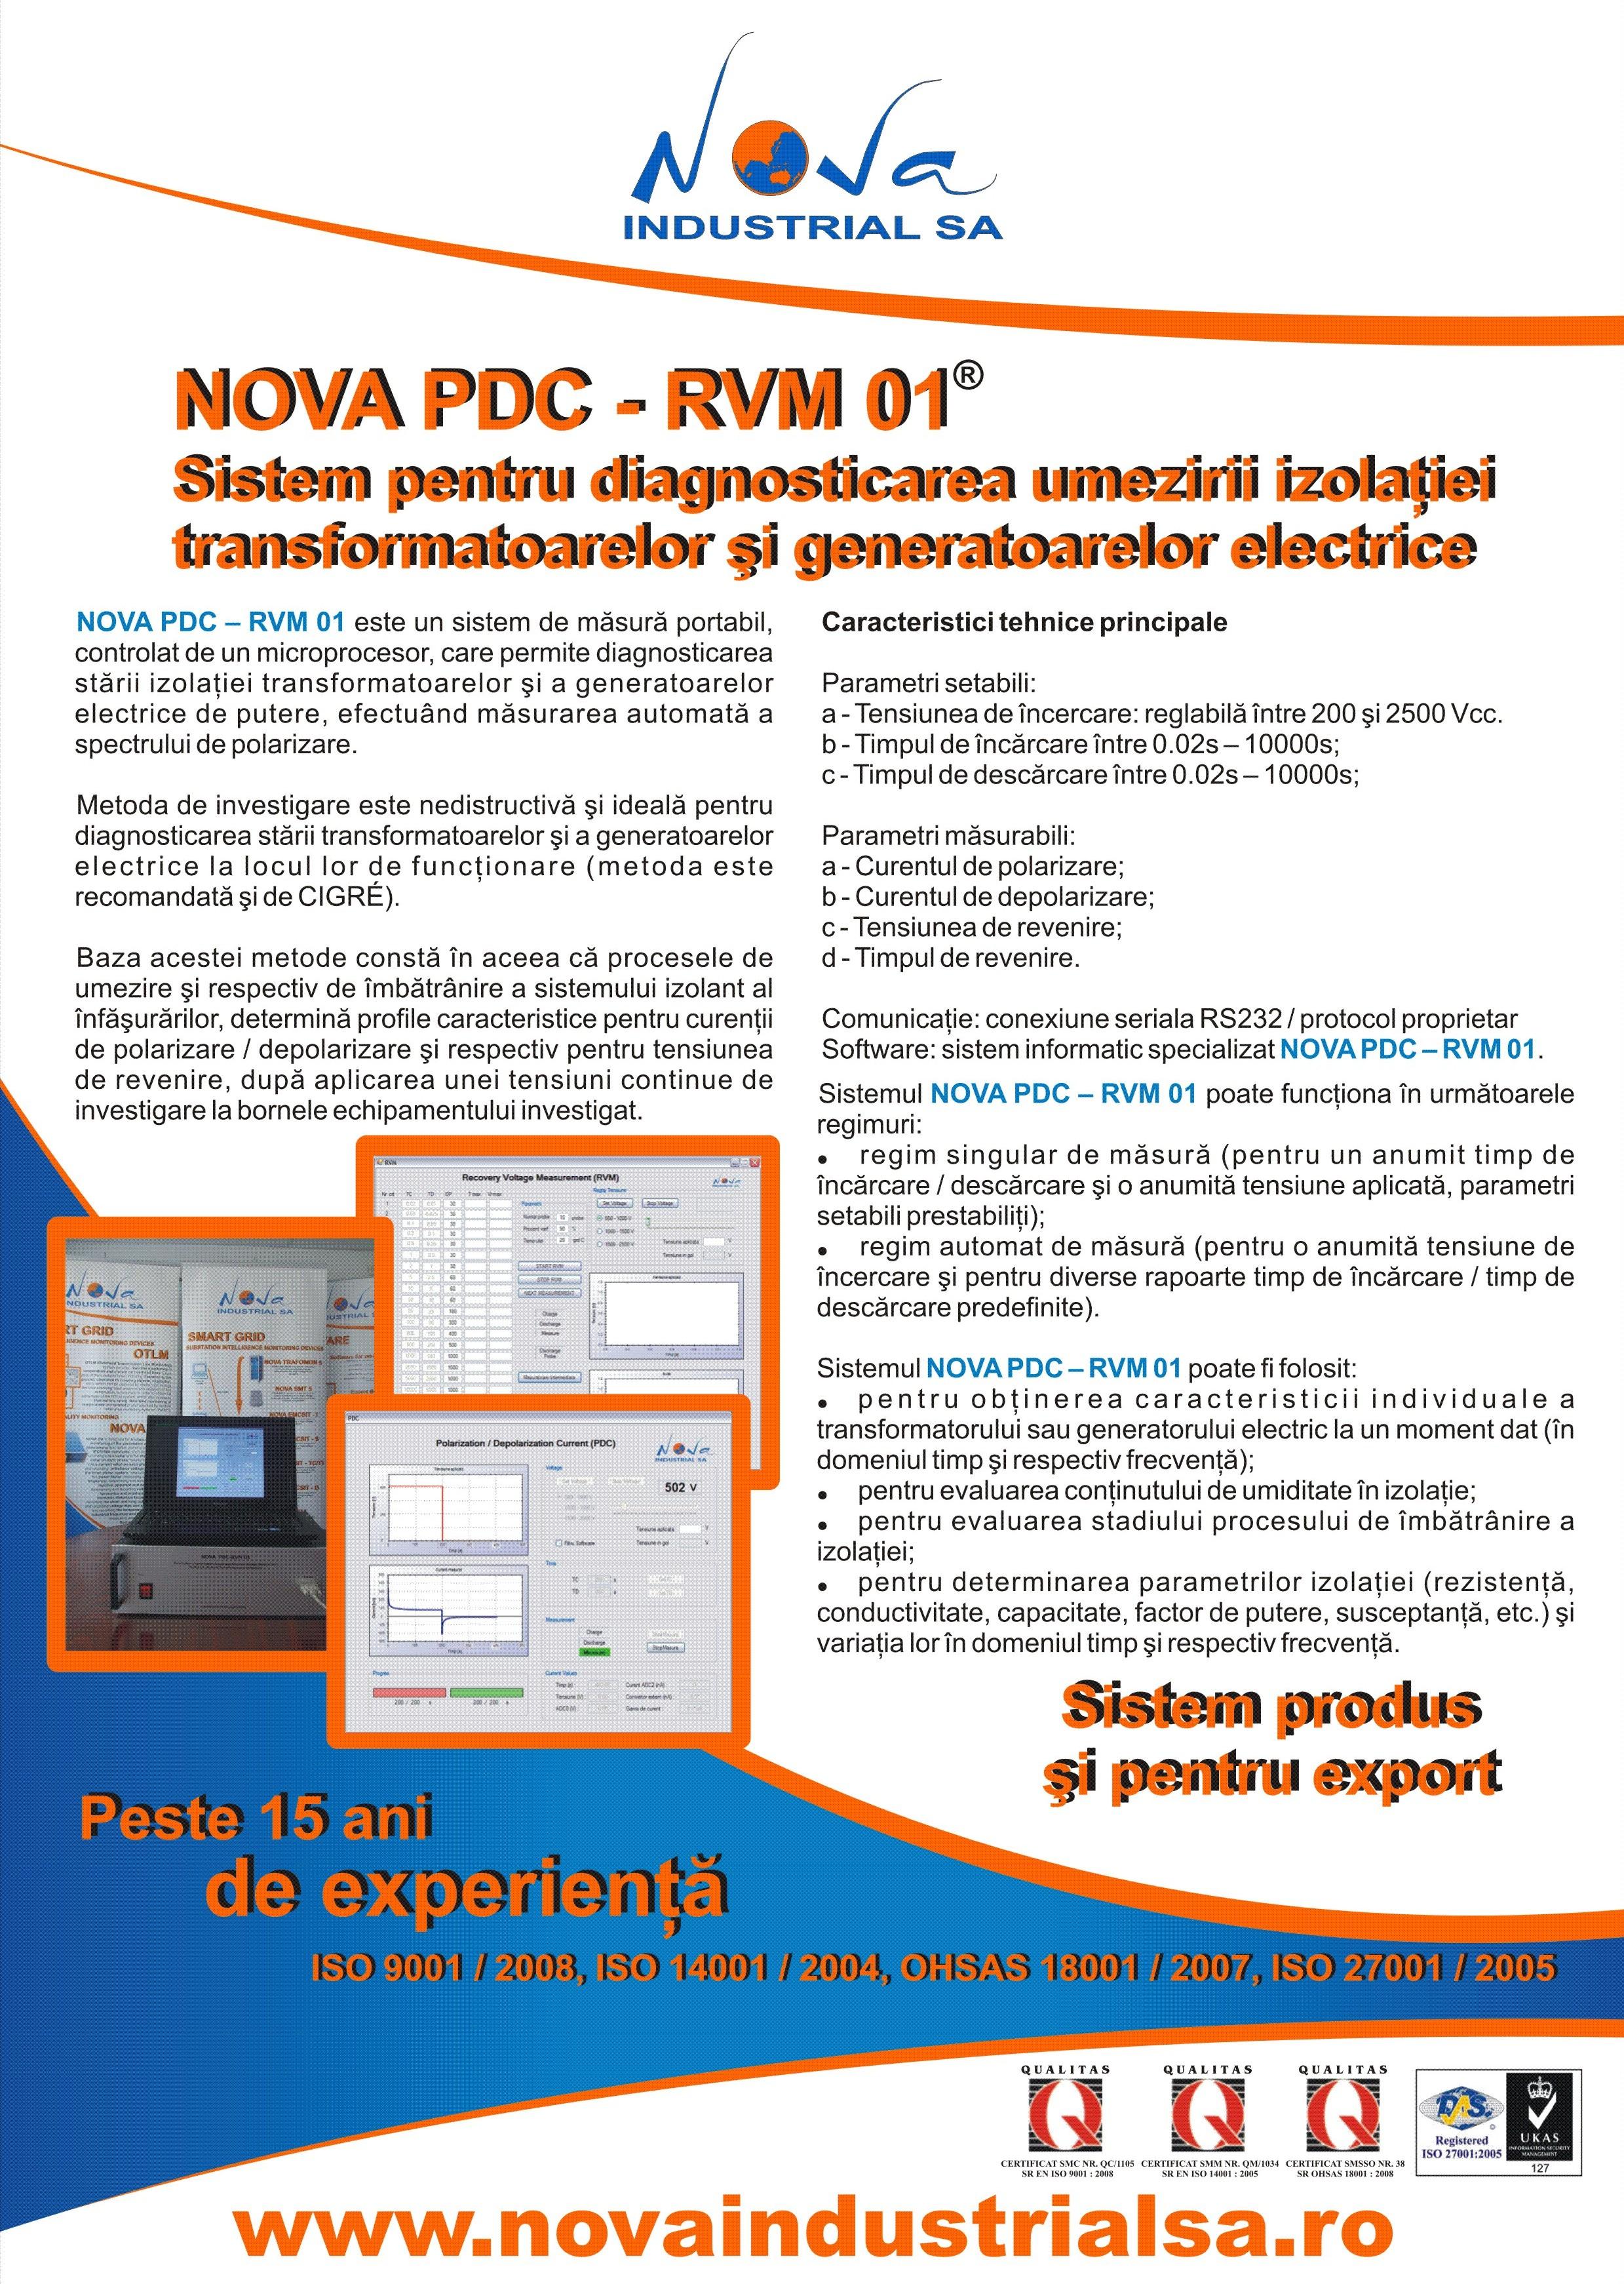 NOVA PDC / RVM 01